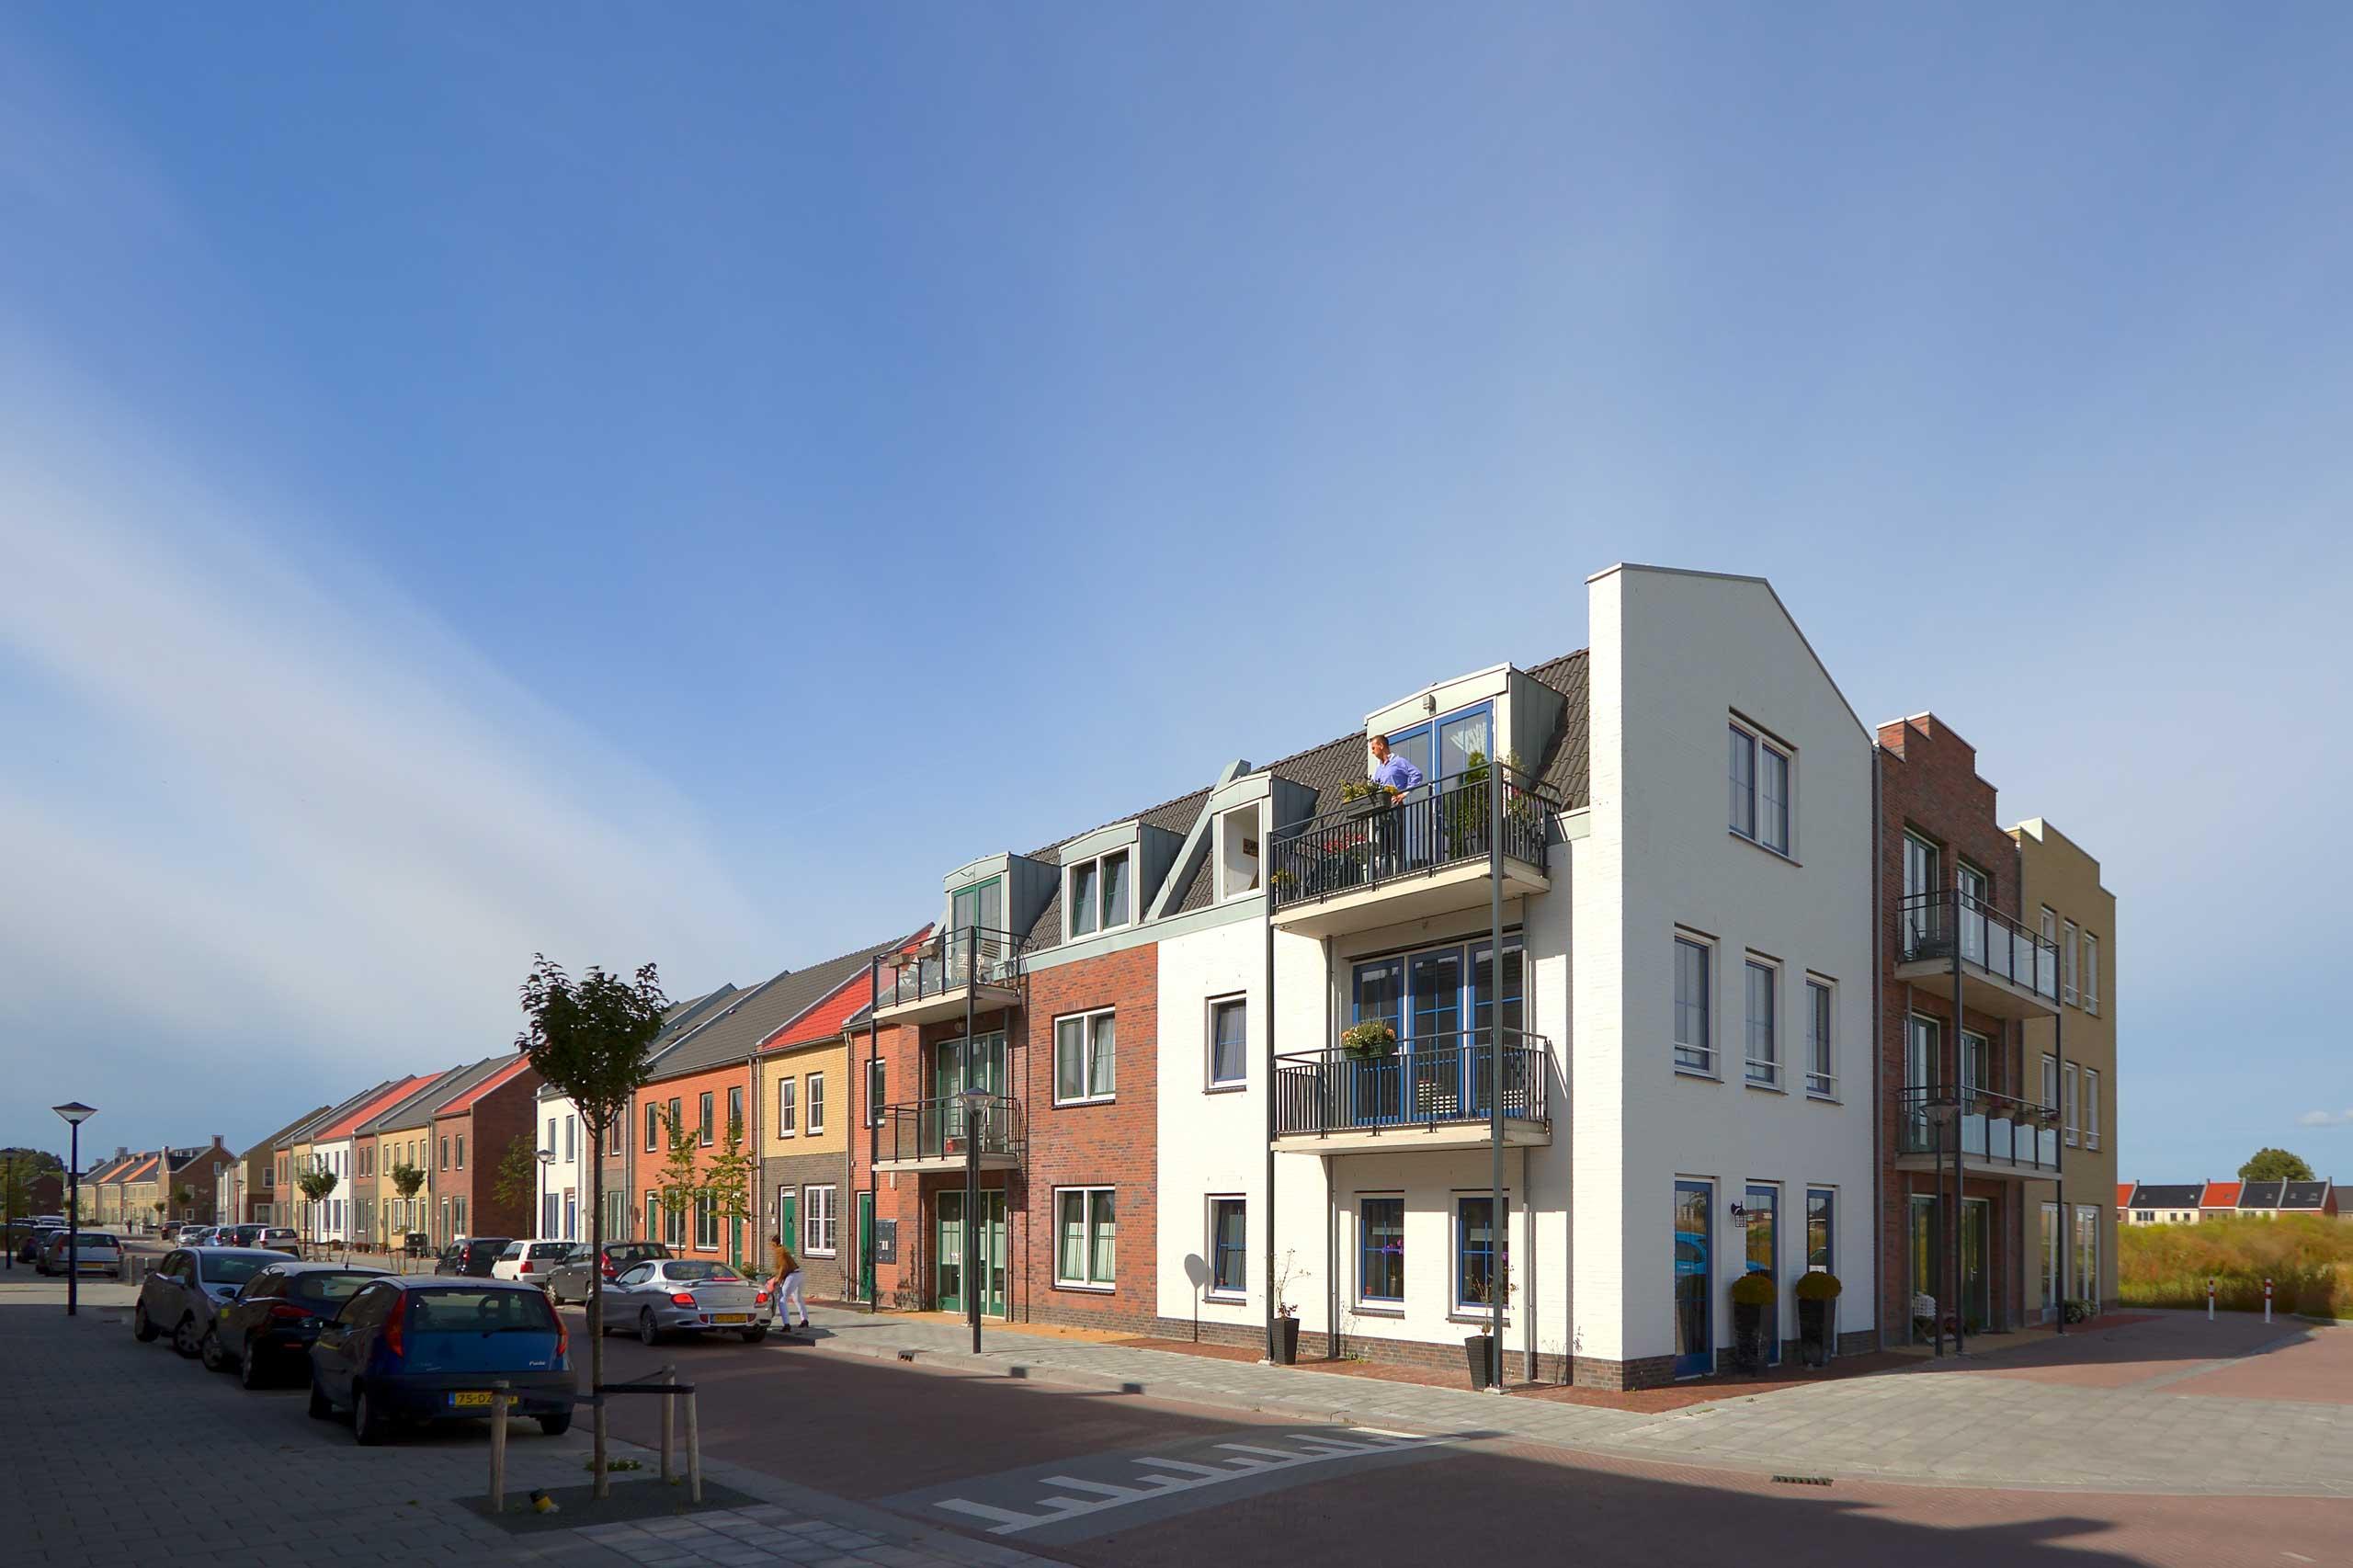 architect woningbouw woningen woningbouw Bangert & Oosterpolder Hoorn architect Ton van 't Hoff dorps bouwen architectuur